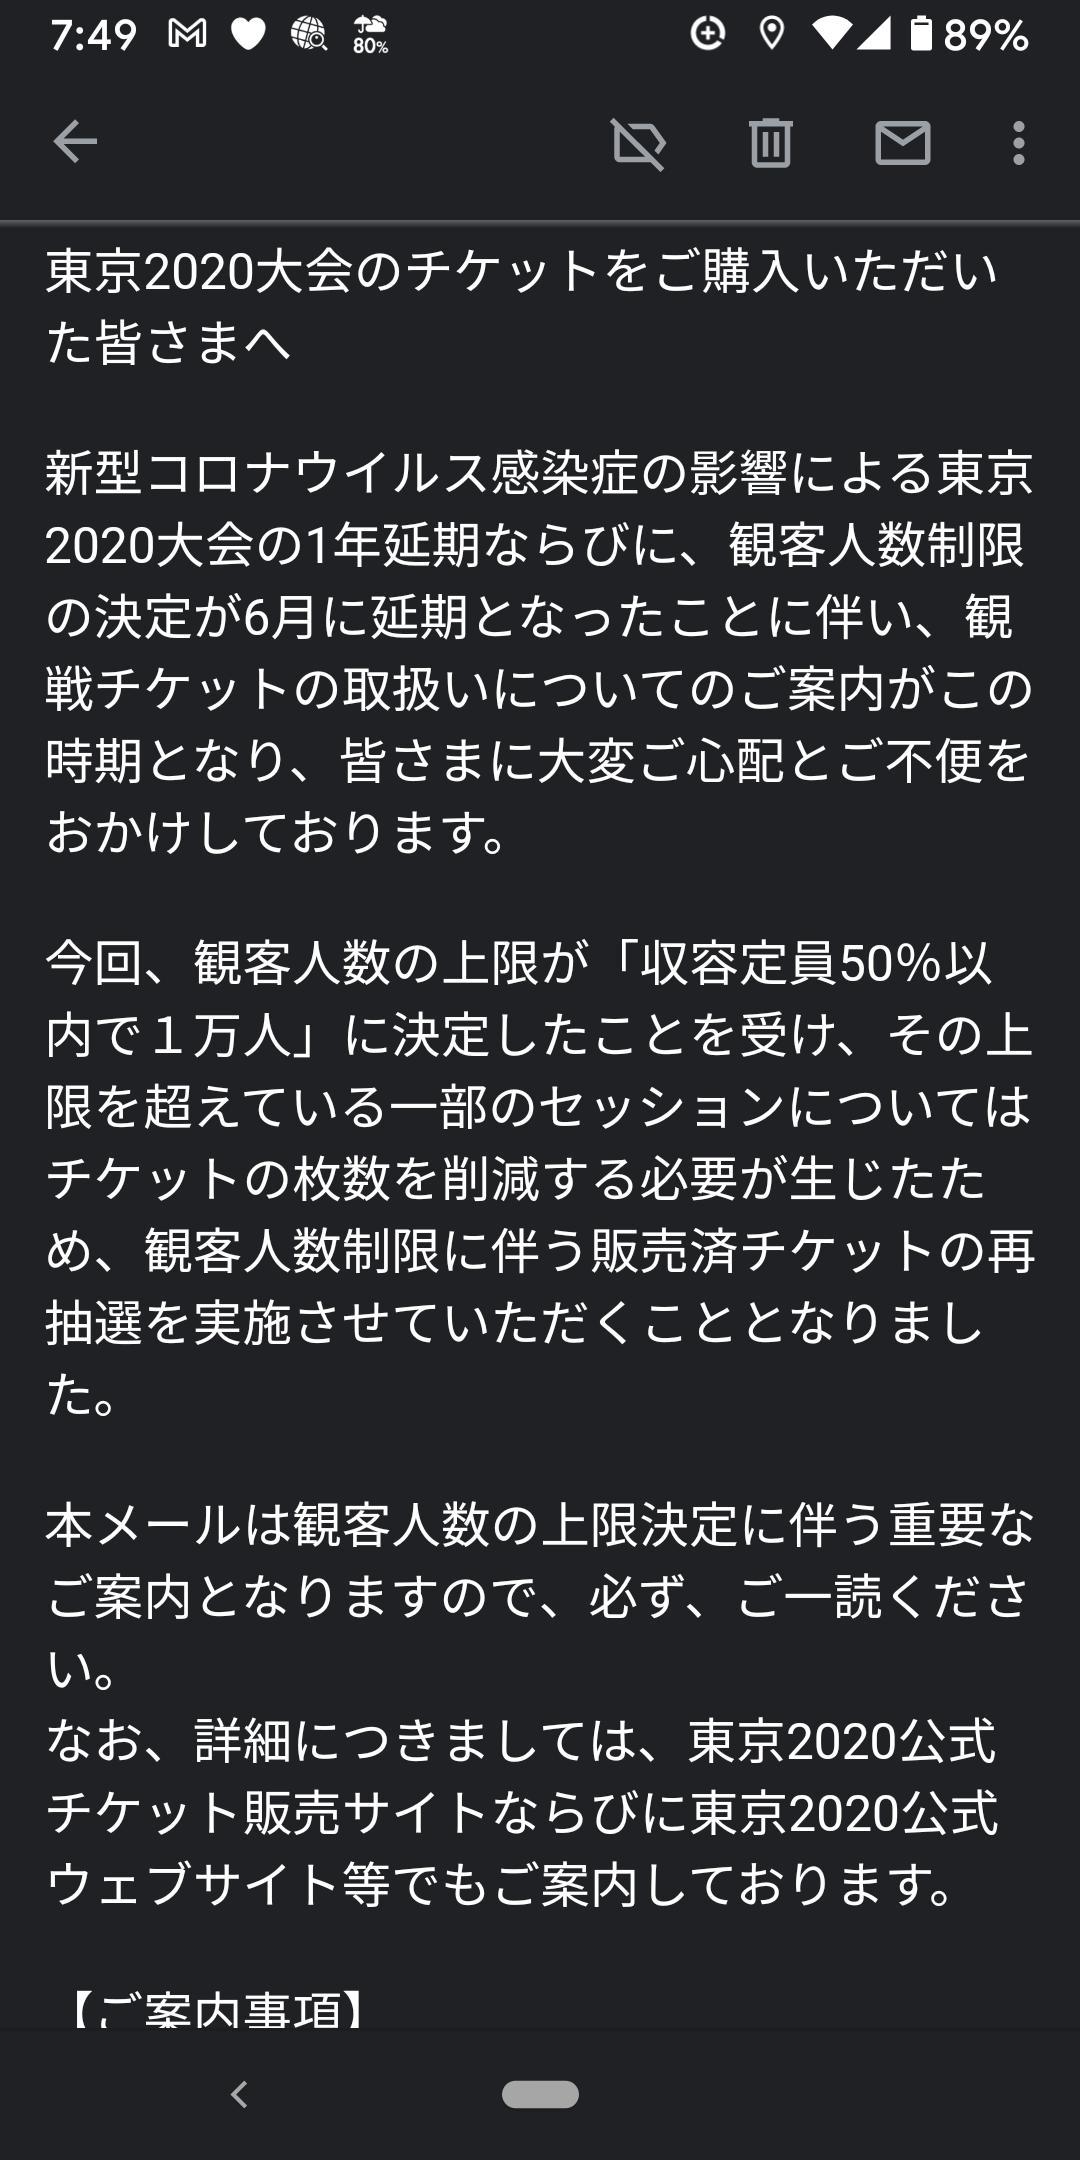 Screenshot_20210709-074904.png